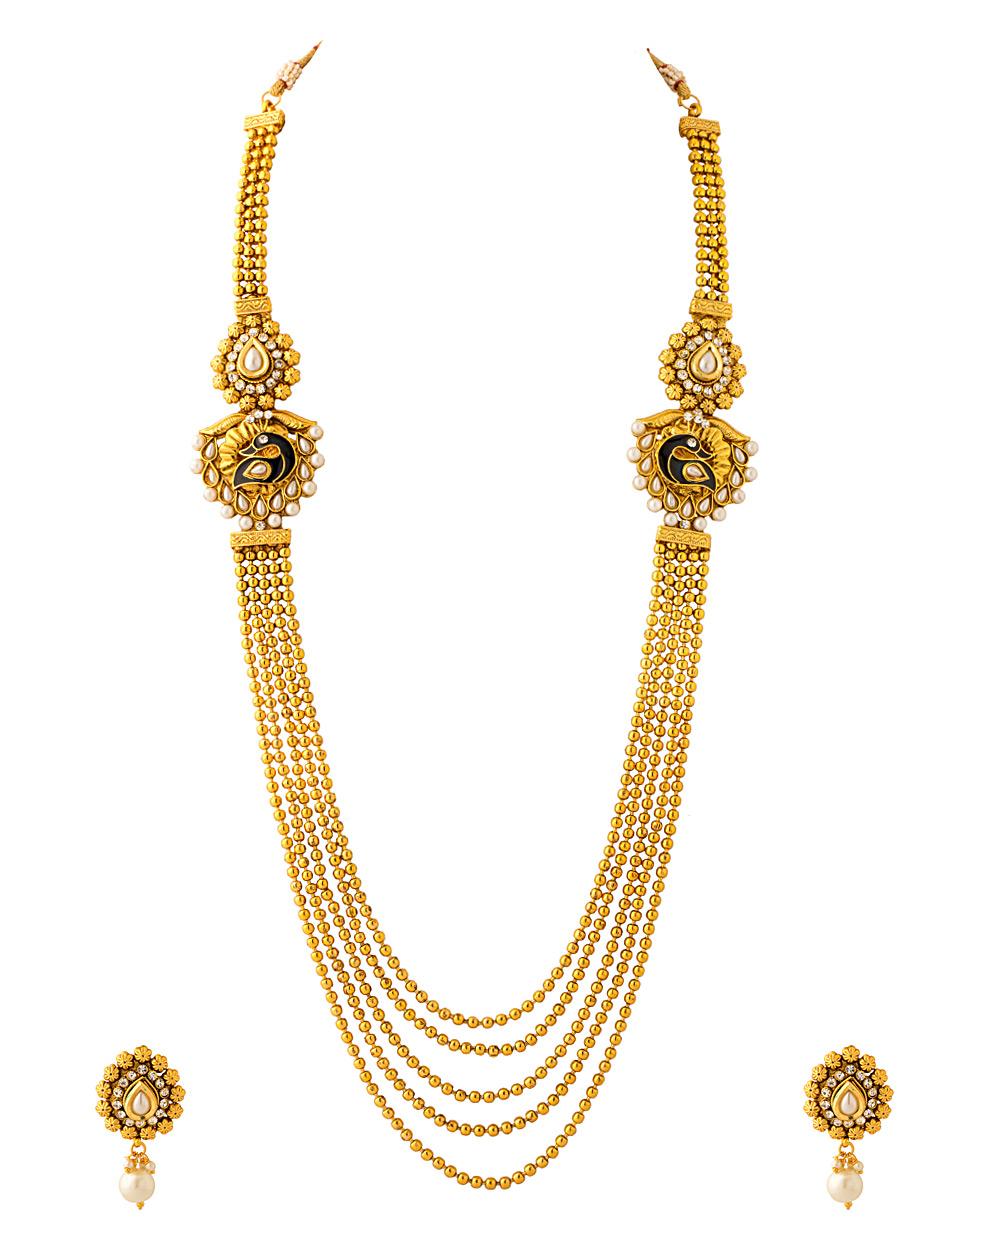 Buy Peacock Inspired Rani Haar Online India | Voylla